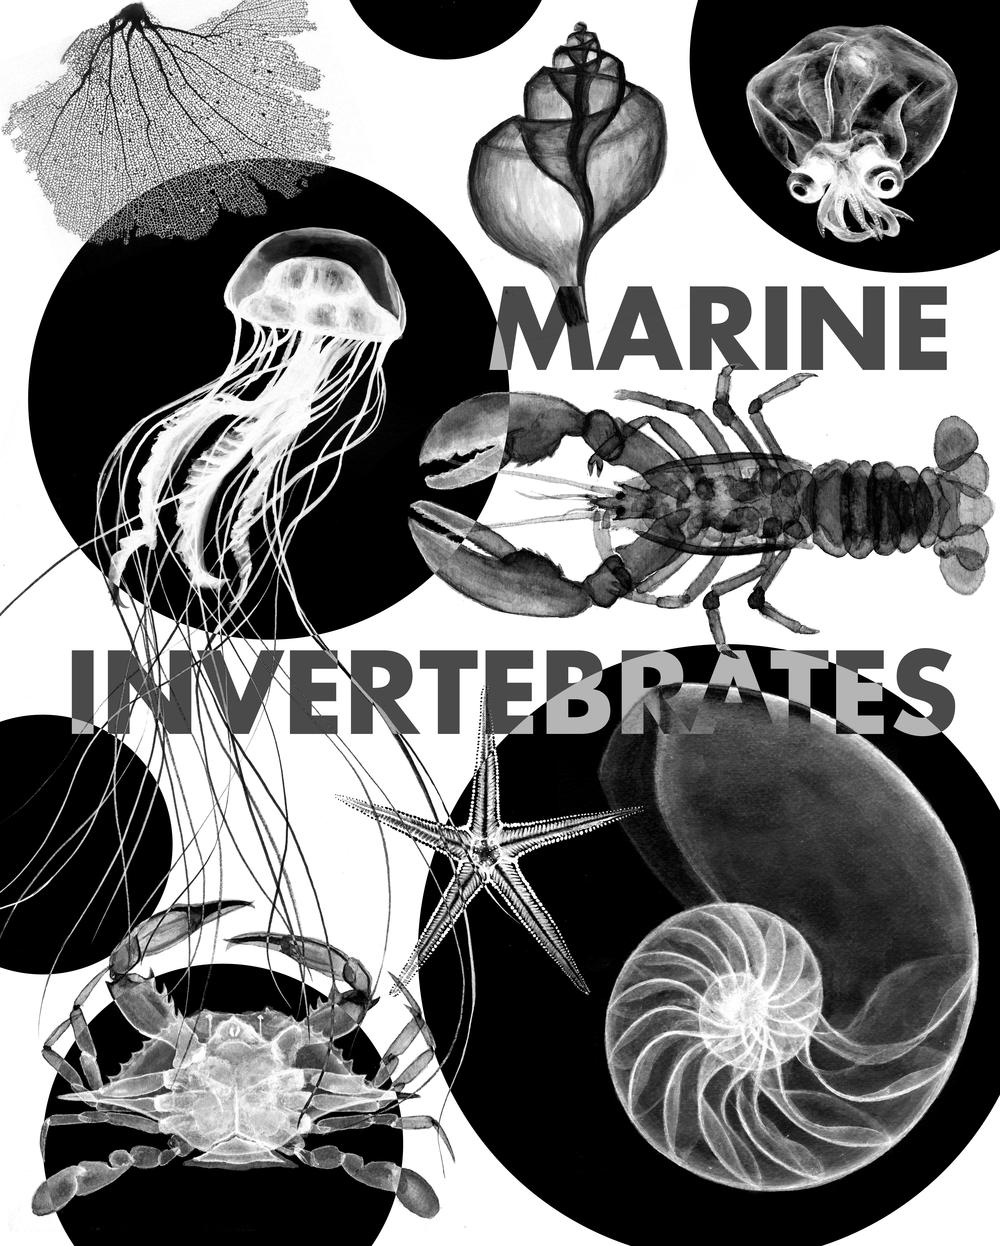 invertebrates4-01.png